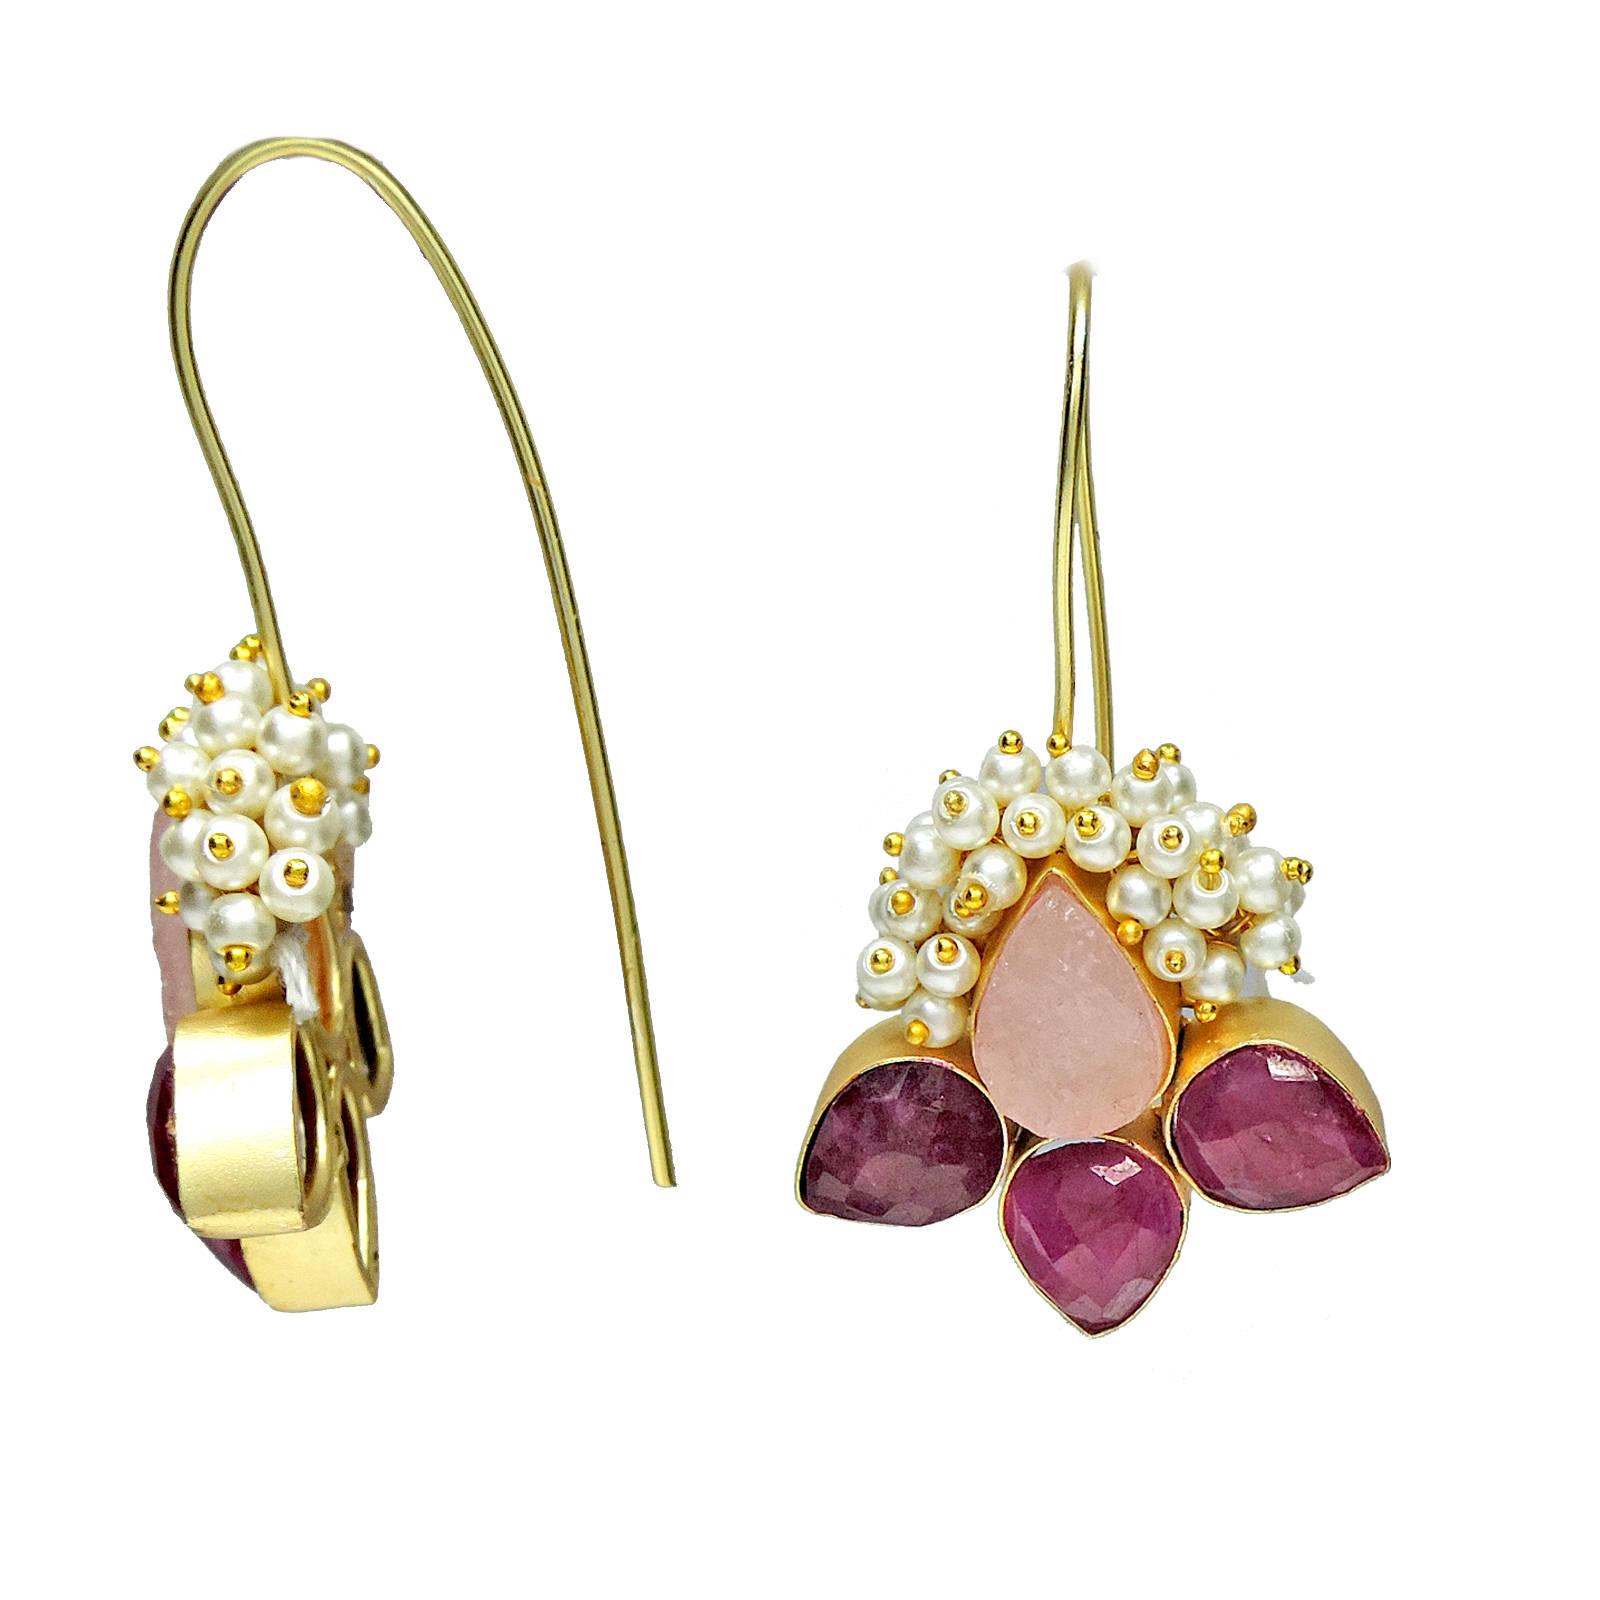 Ruby, Rose Quartz, Pearl Earrings